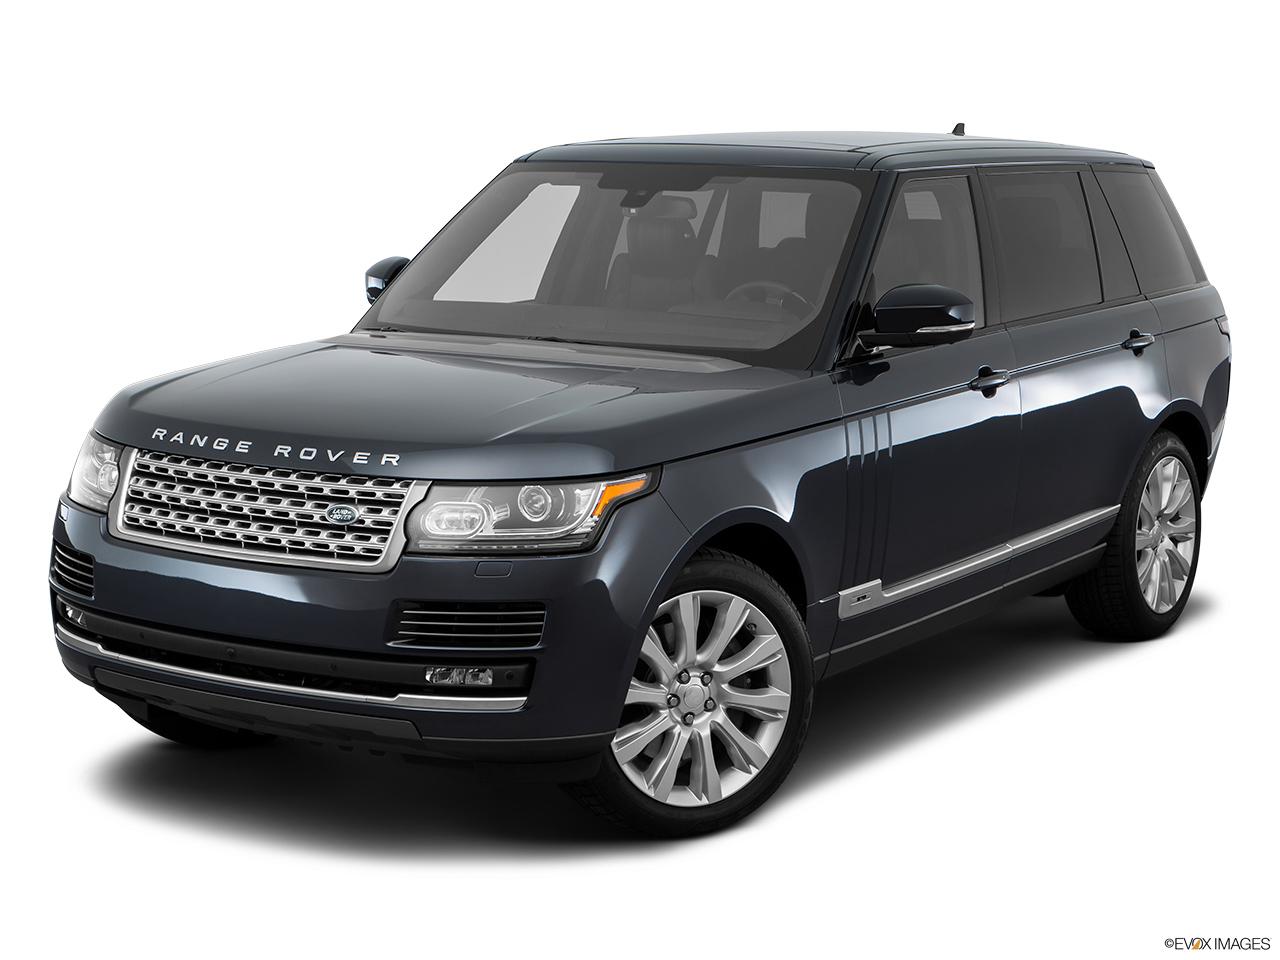 Land Rover Range Rover 2018 5 0l Sc Vogue Se Lwb 525 Ps In